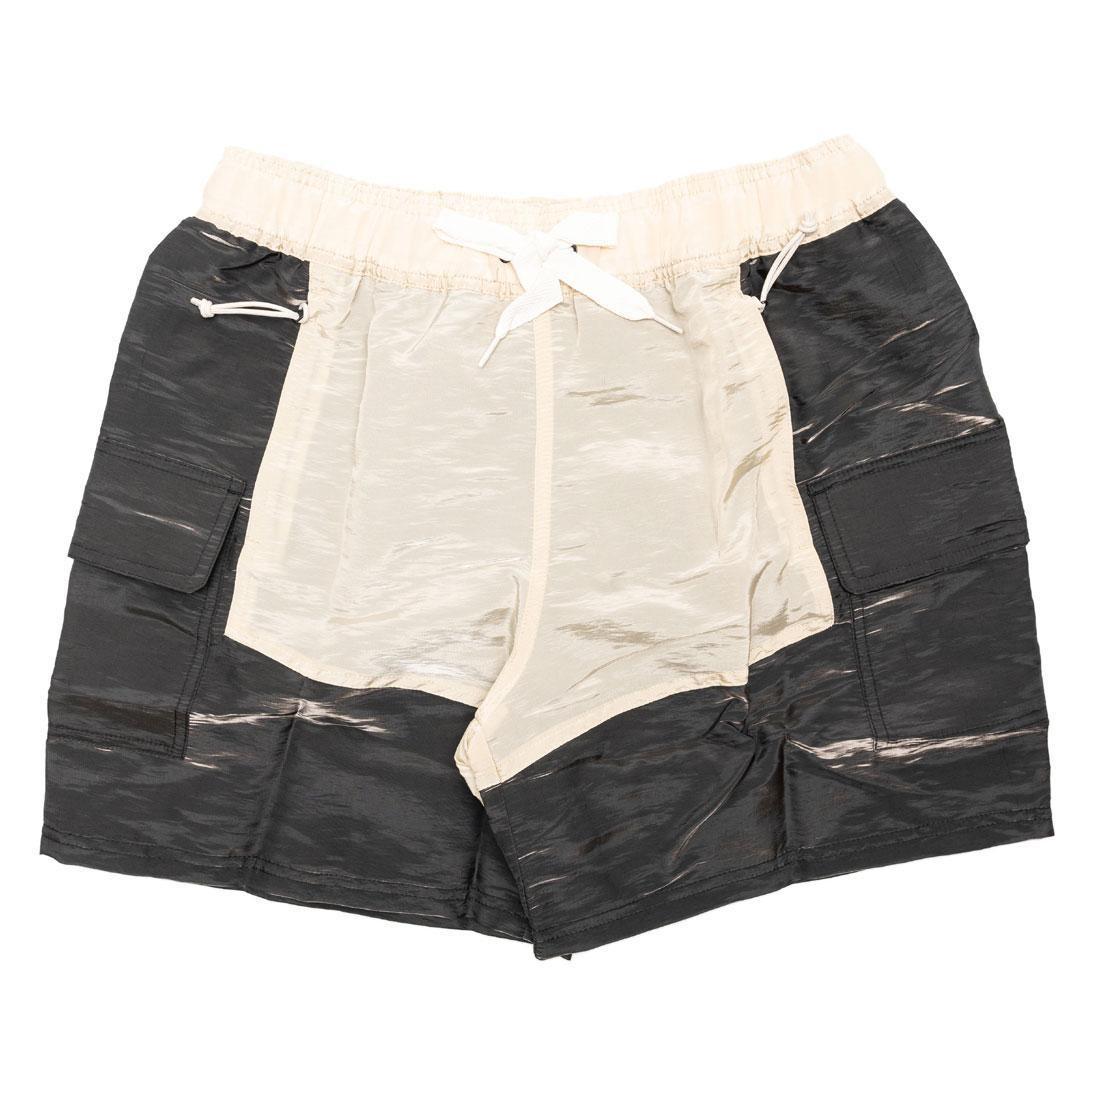 Puma Men Rhuigi Shorts (black / oatmeal)